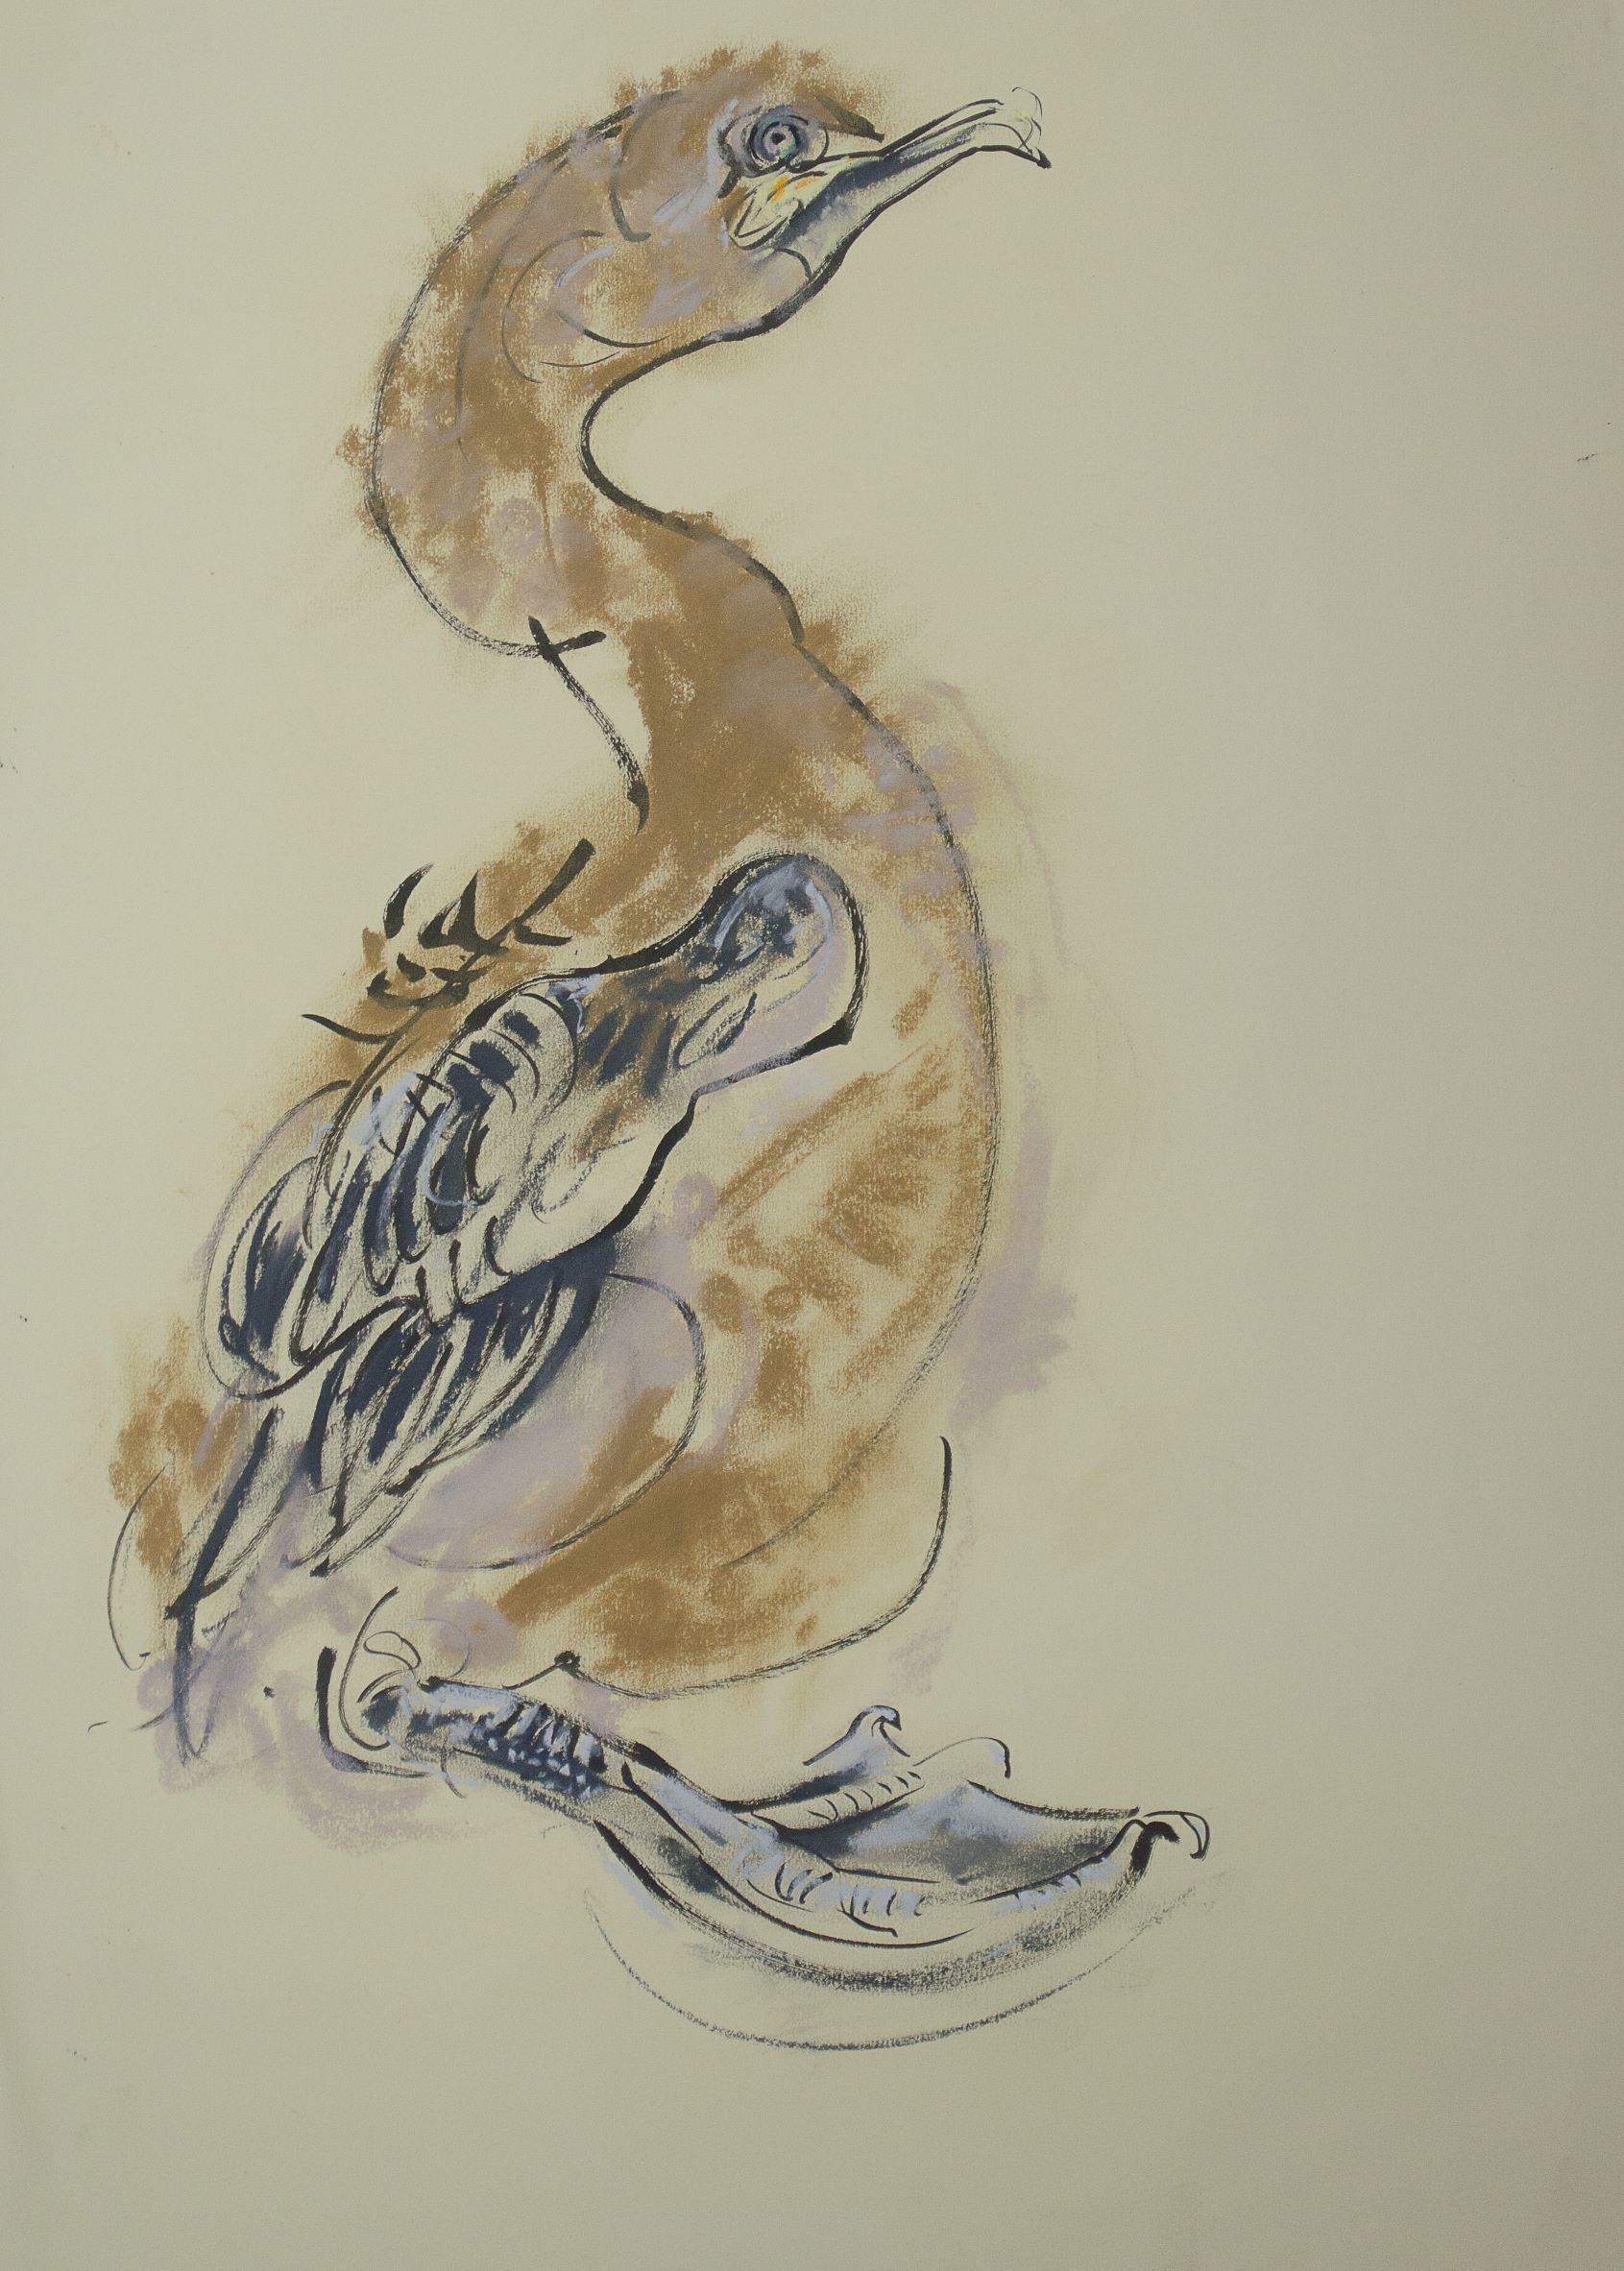 Shag chick, Fidra, Ink and soft pastel, 59 cm x 42 cm